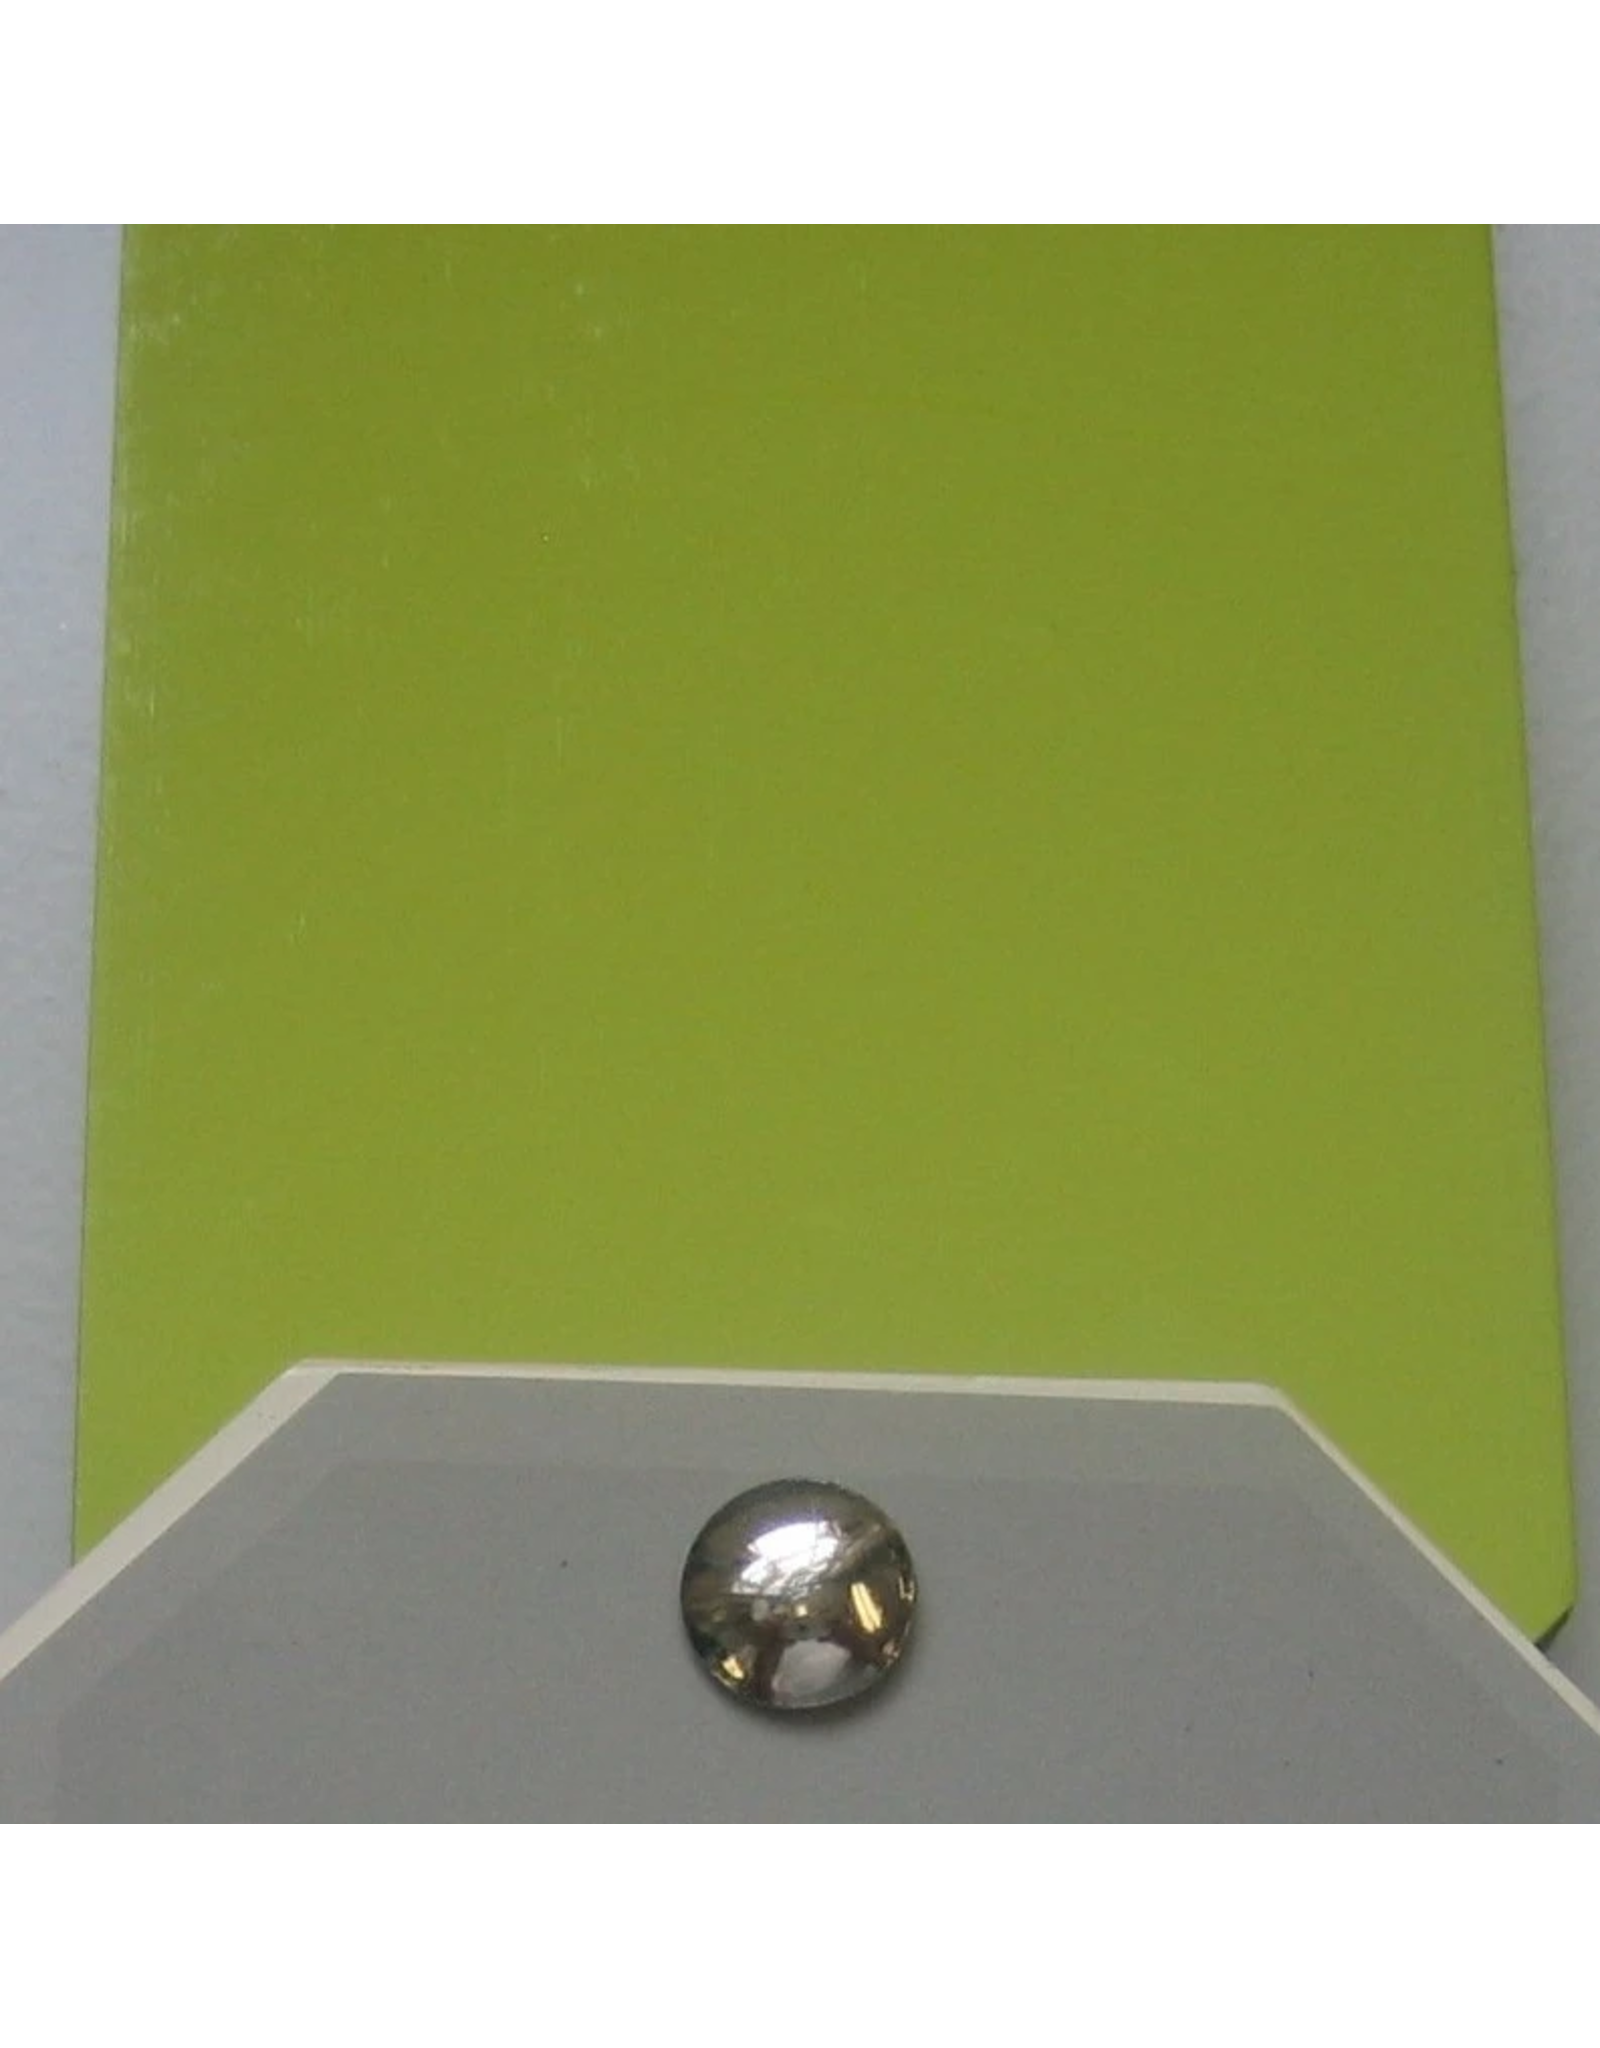 Farrow and Ball Gallon Modern Emulsion No 9908 Acid Drop